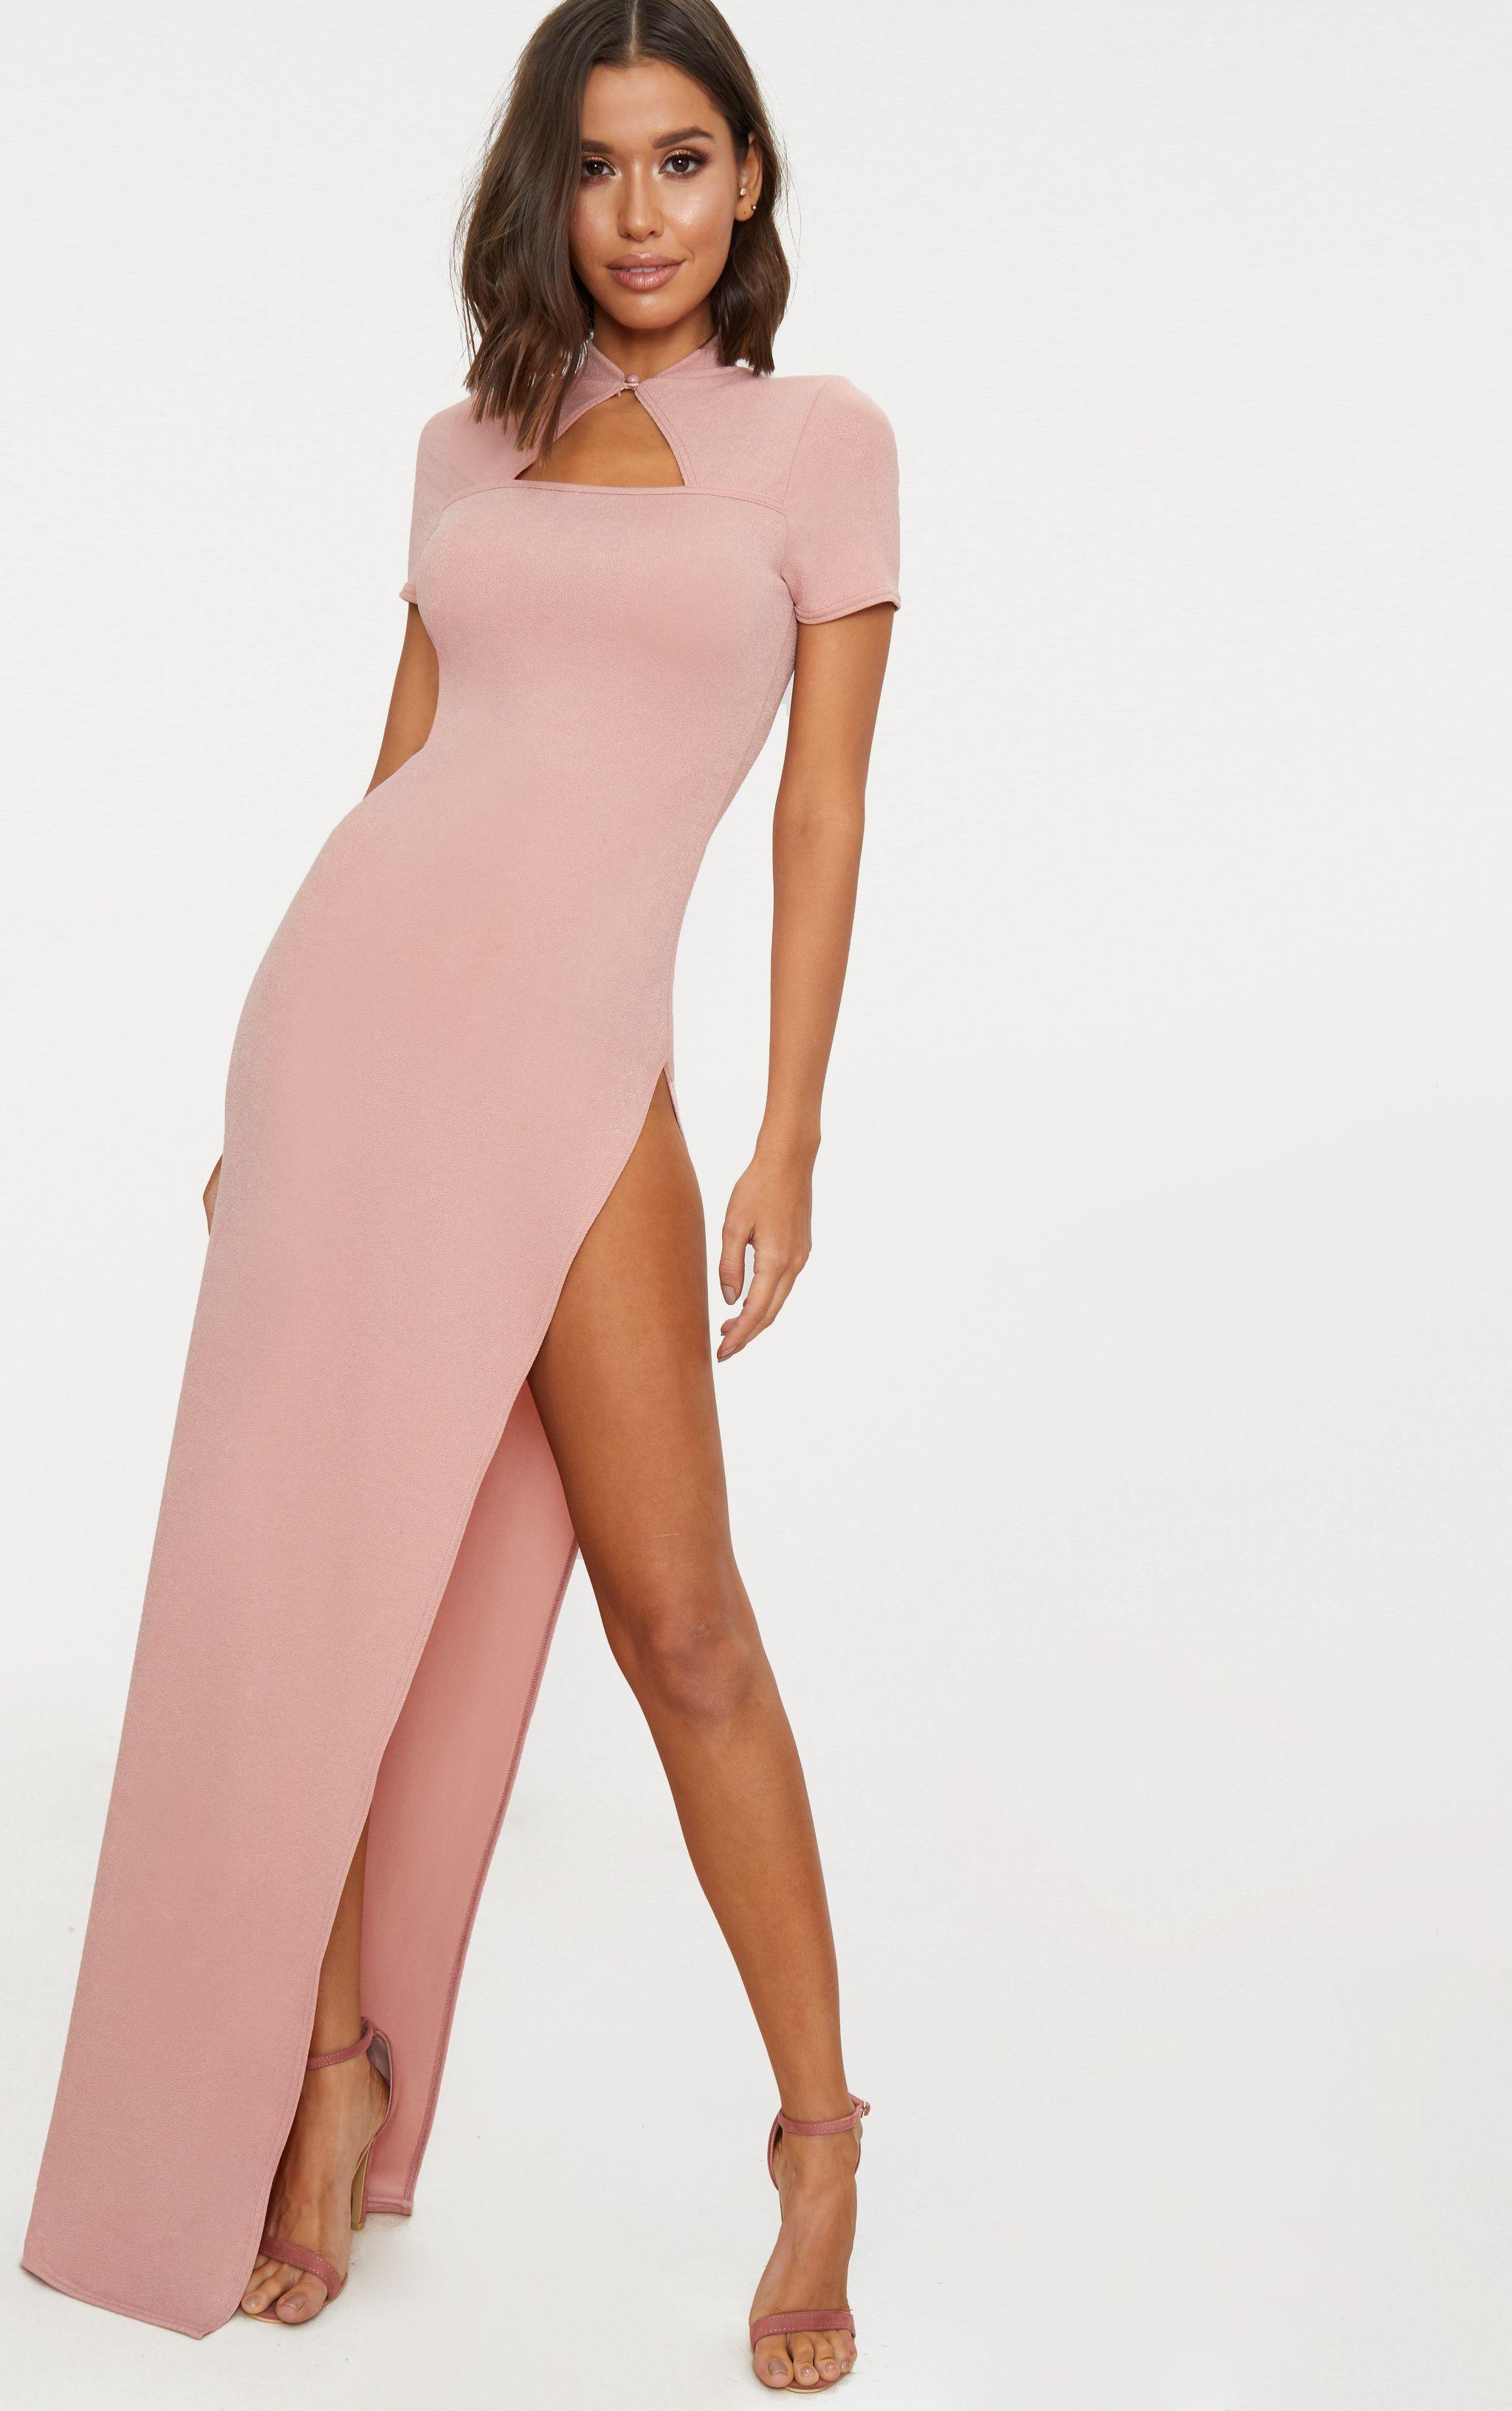 Dusty Pink Oriental Cut Out Detail Maxi Dress